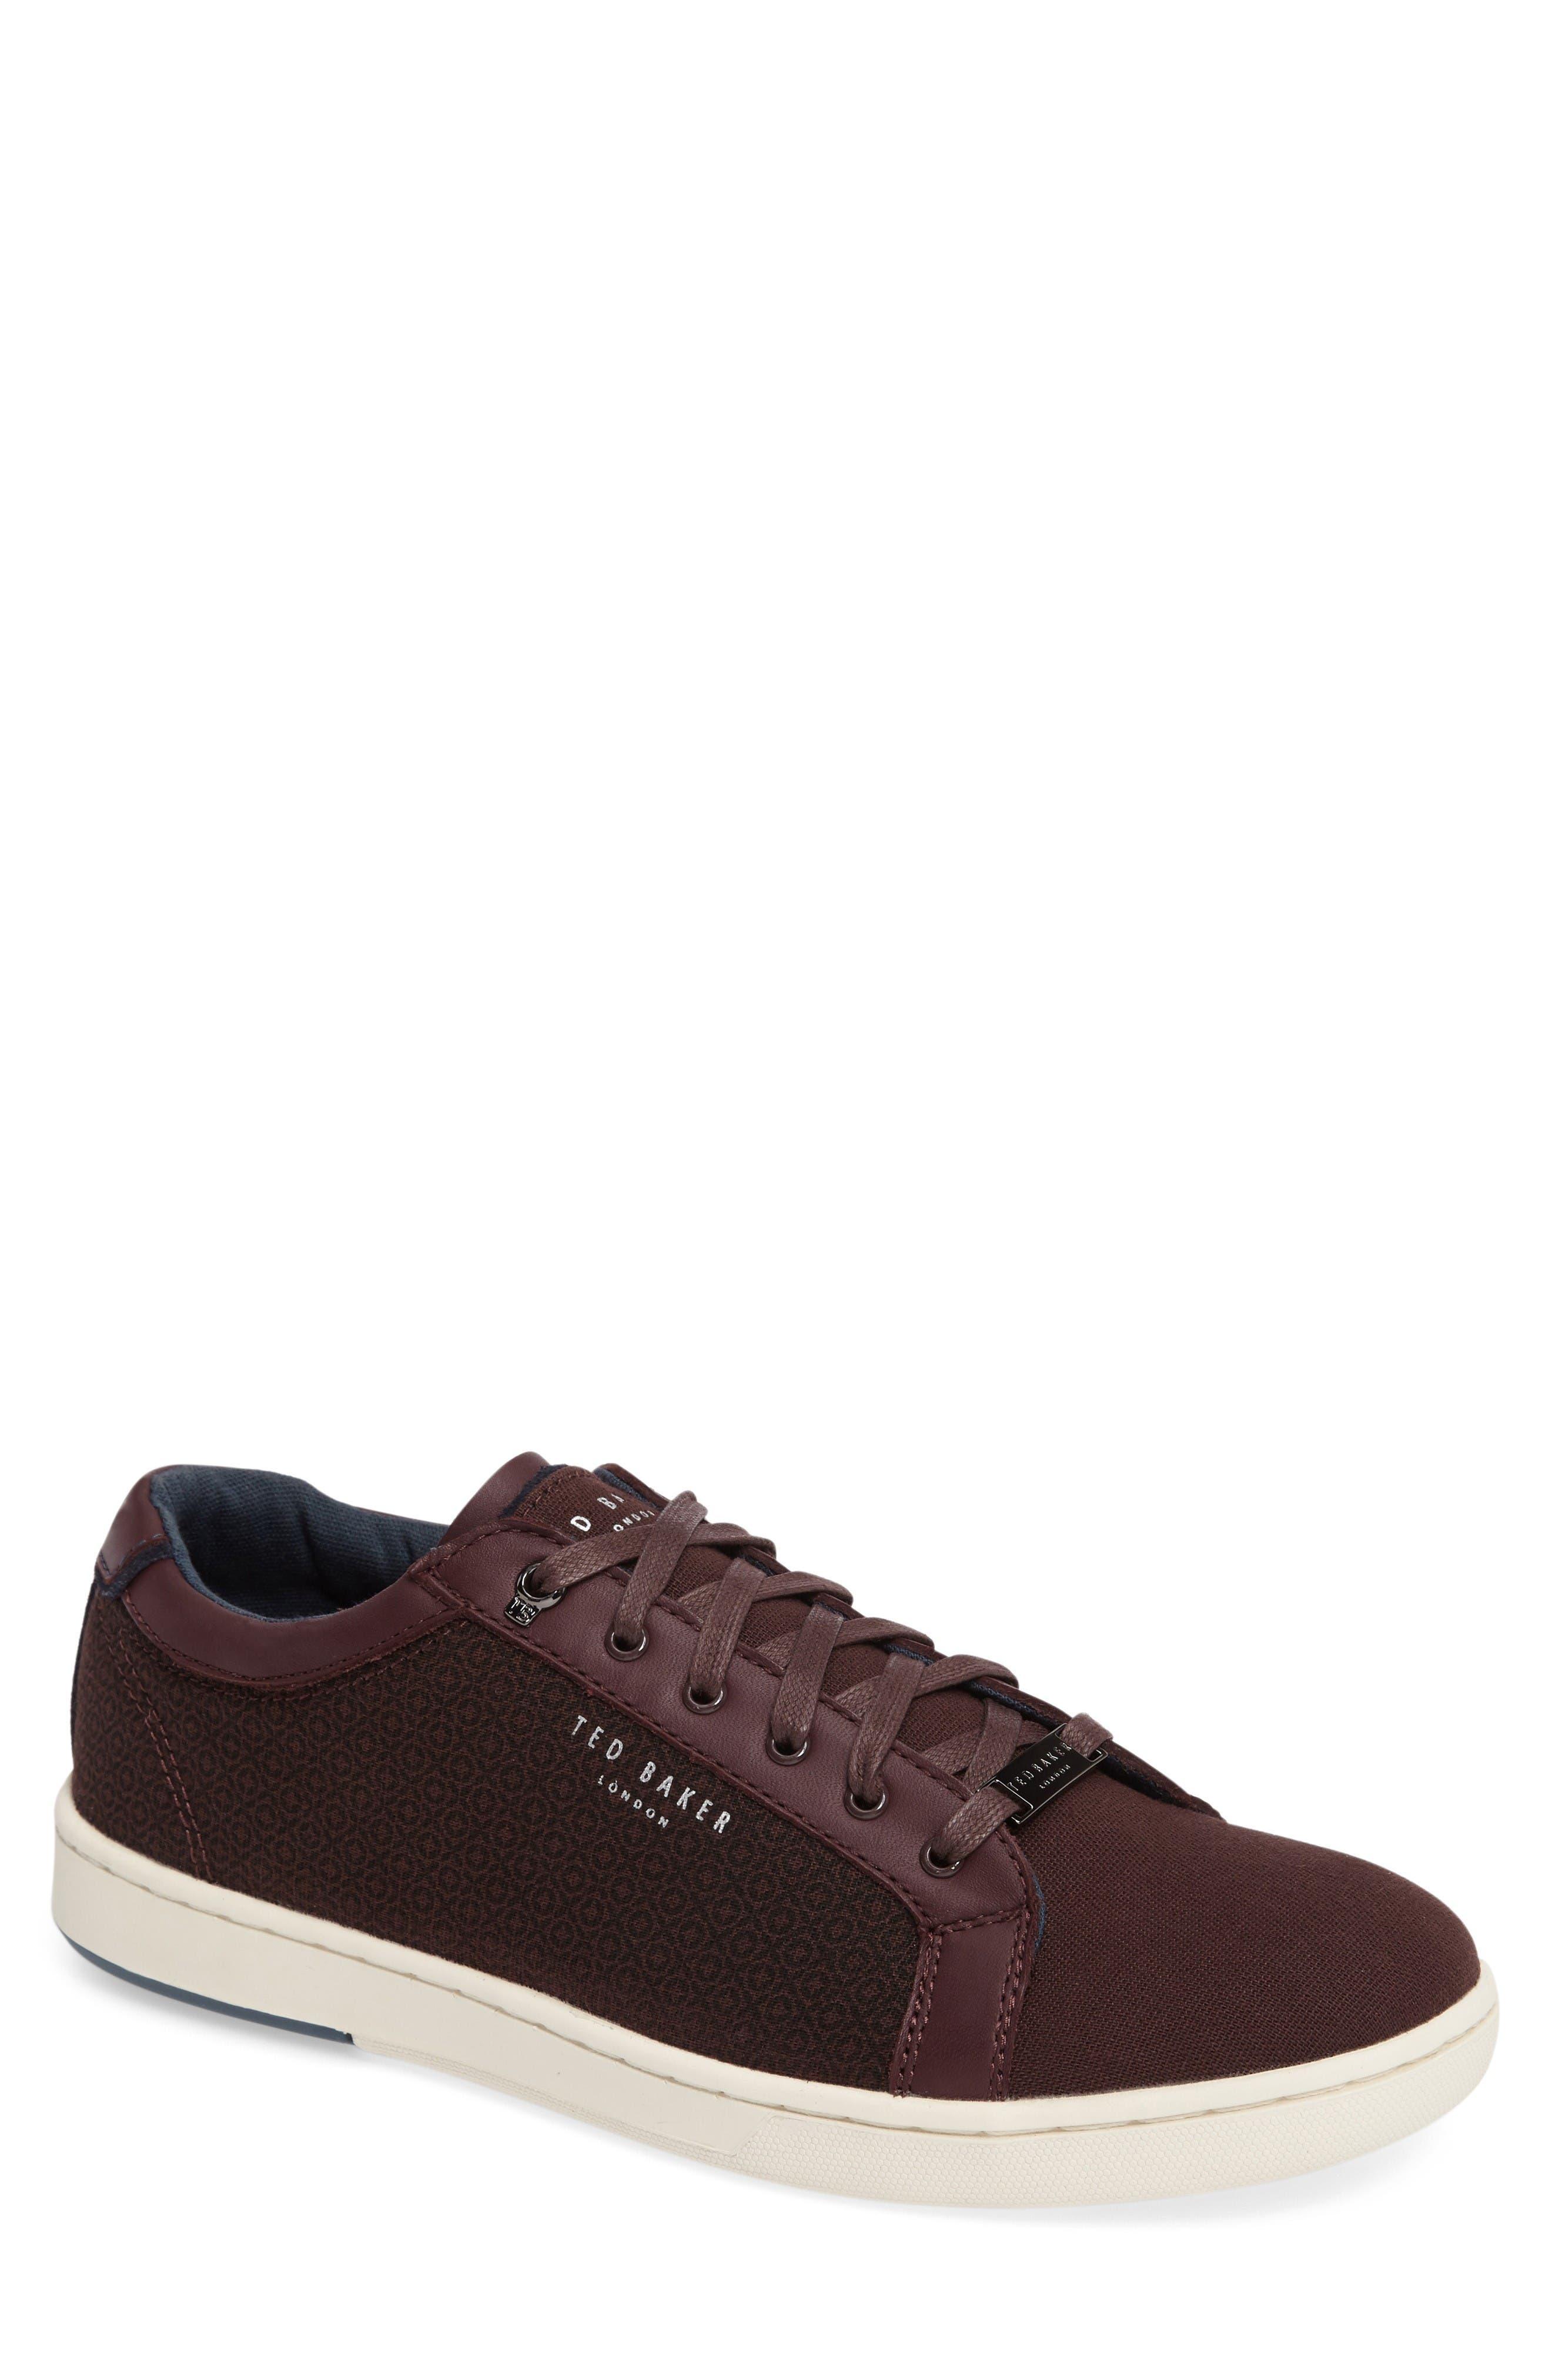 Ternur Geo Print Sneaker,                         Main,                         color, Dark Red